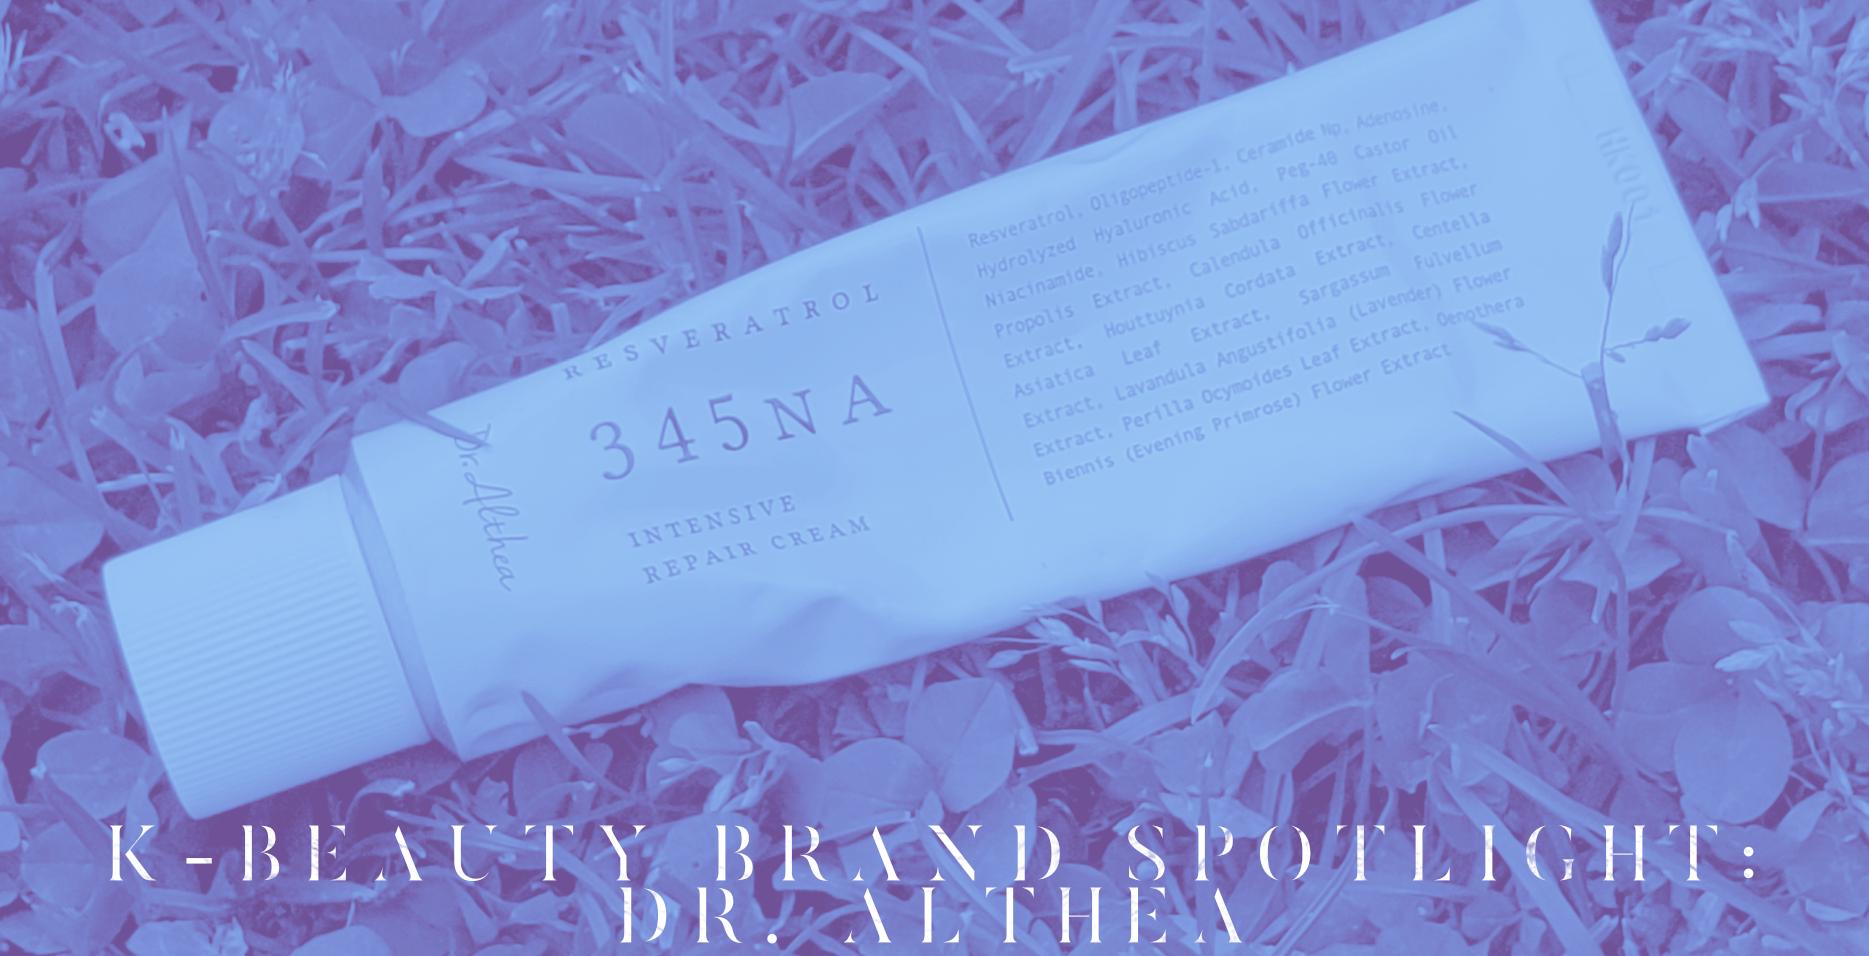 k-beauty brand spotlight dr. althea banner